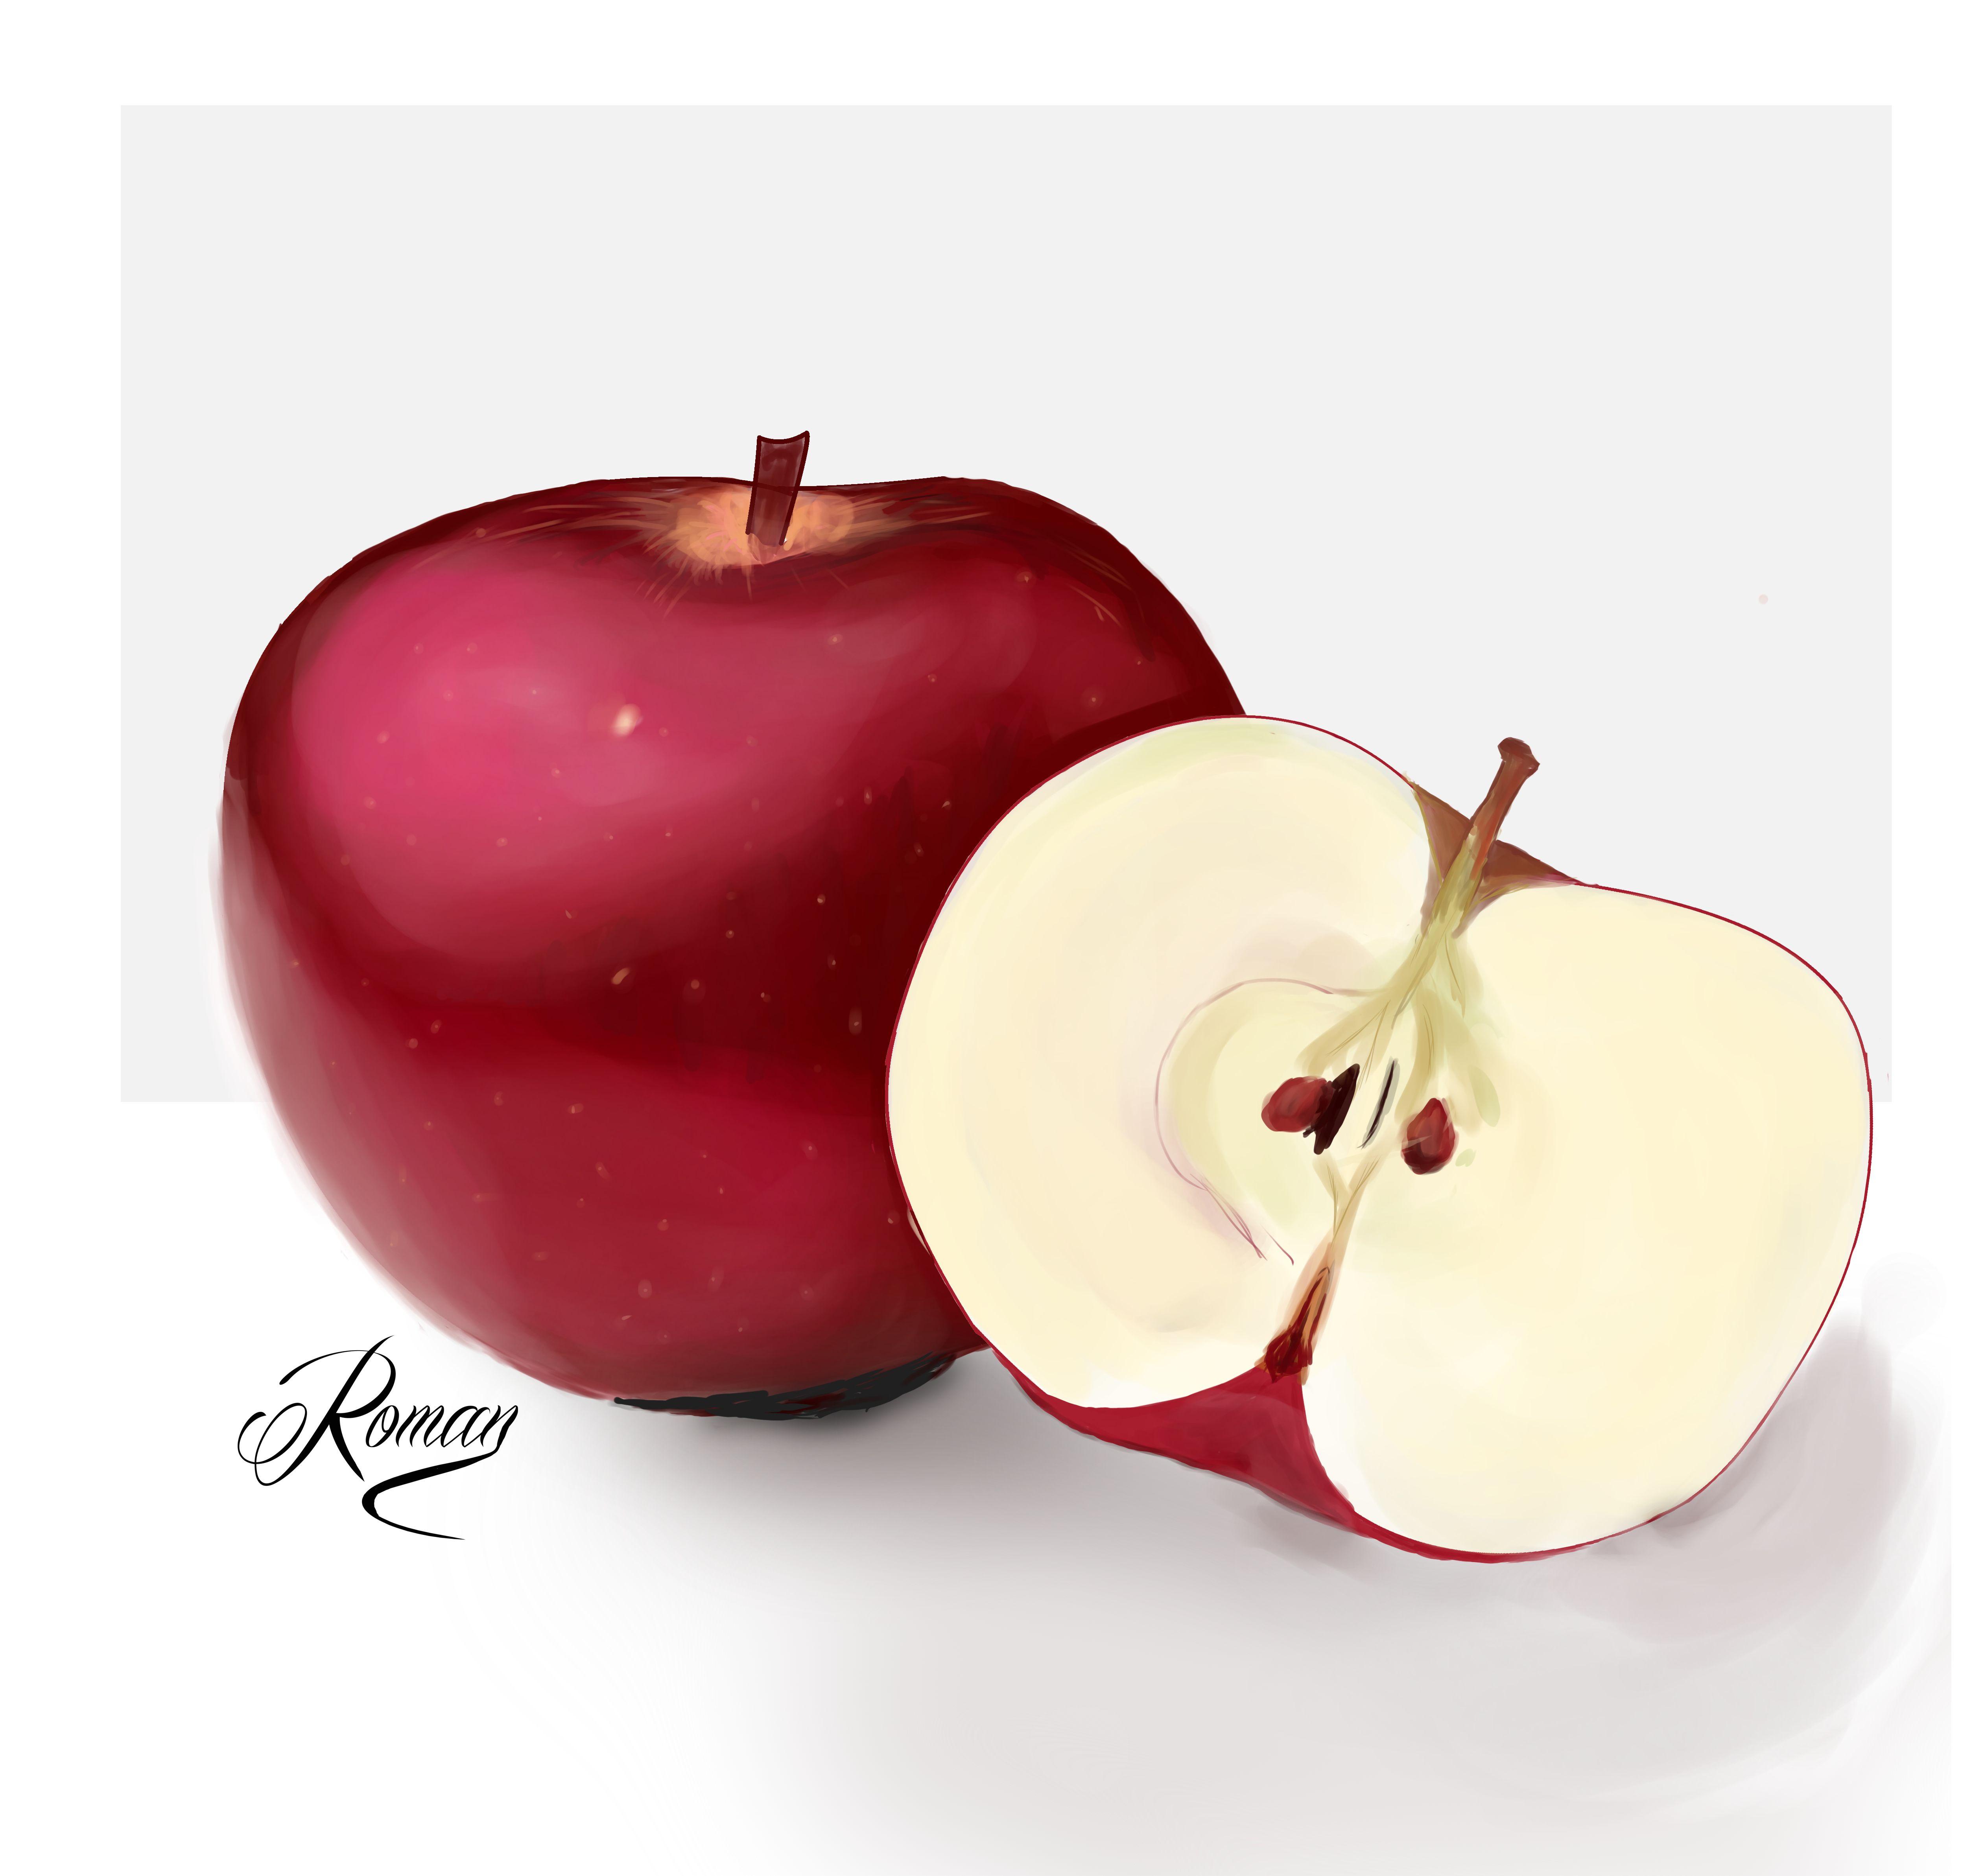 Dibujo Realista Manzana Manzanas Dibujo Dibujos Con Mandalas Manzana